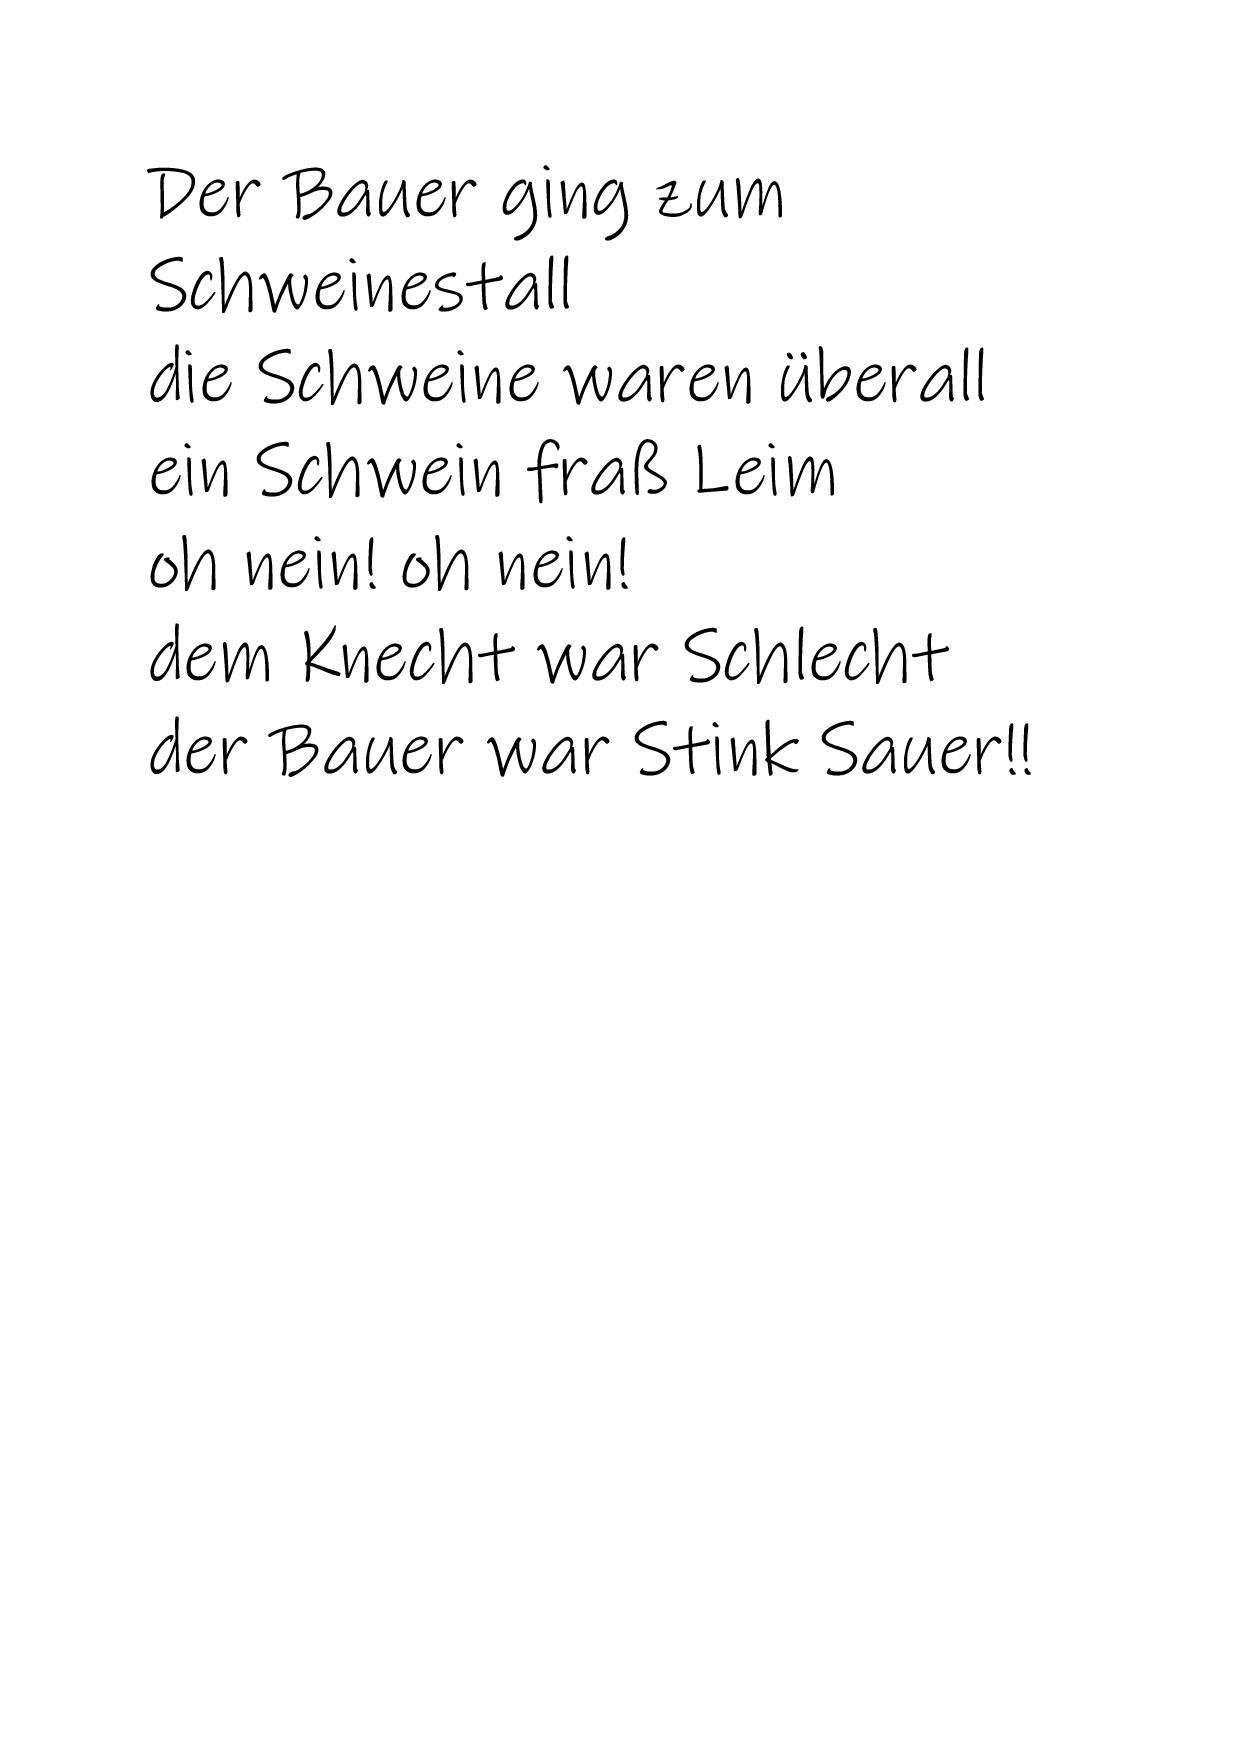 Orla_Gedicht_1.jpg